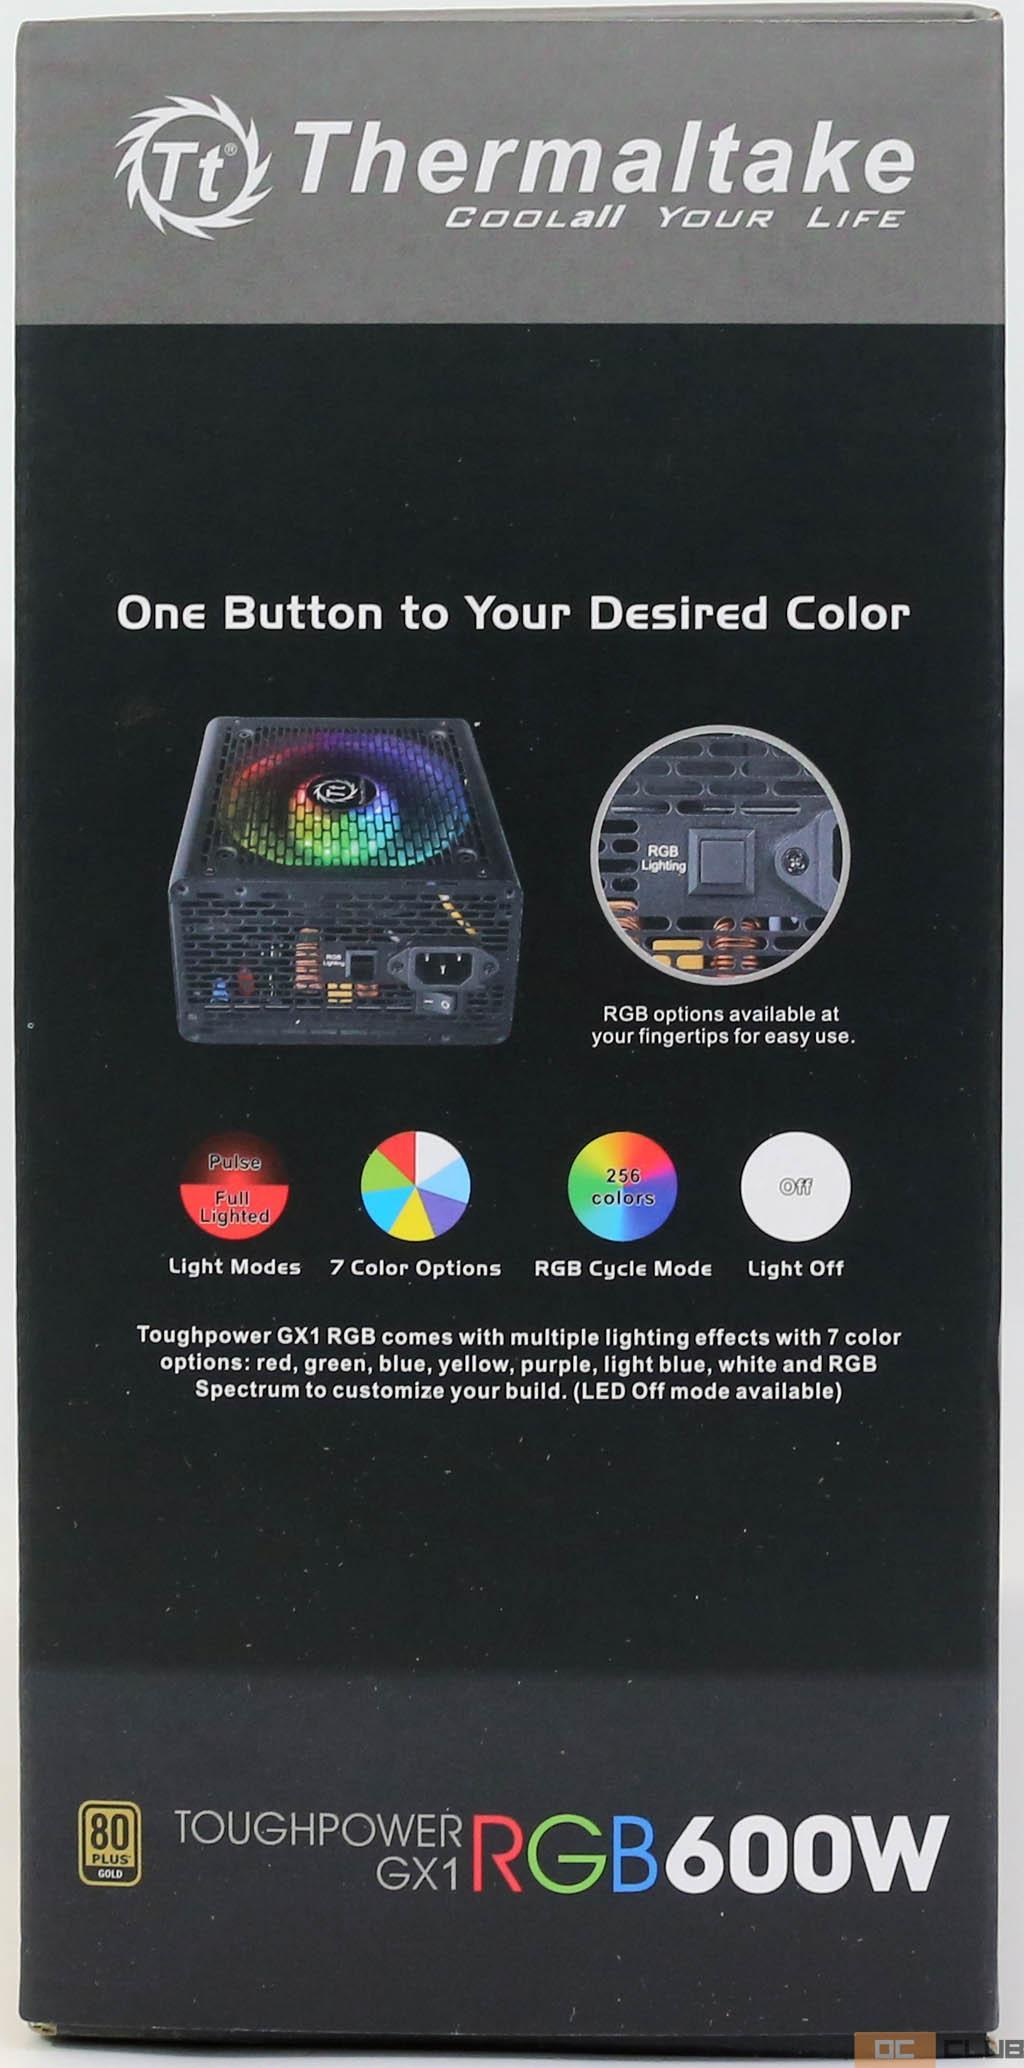 Thermaltake ToughPower GX1 RGB 600 Вт: обзор. Эксперимент удался